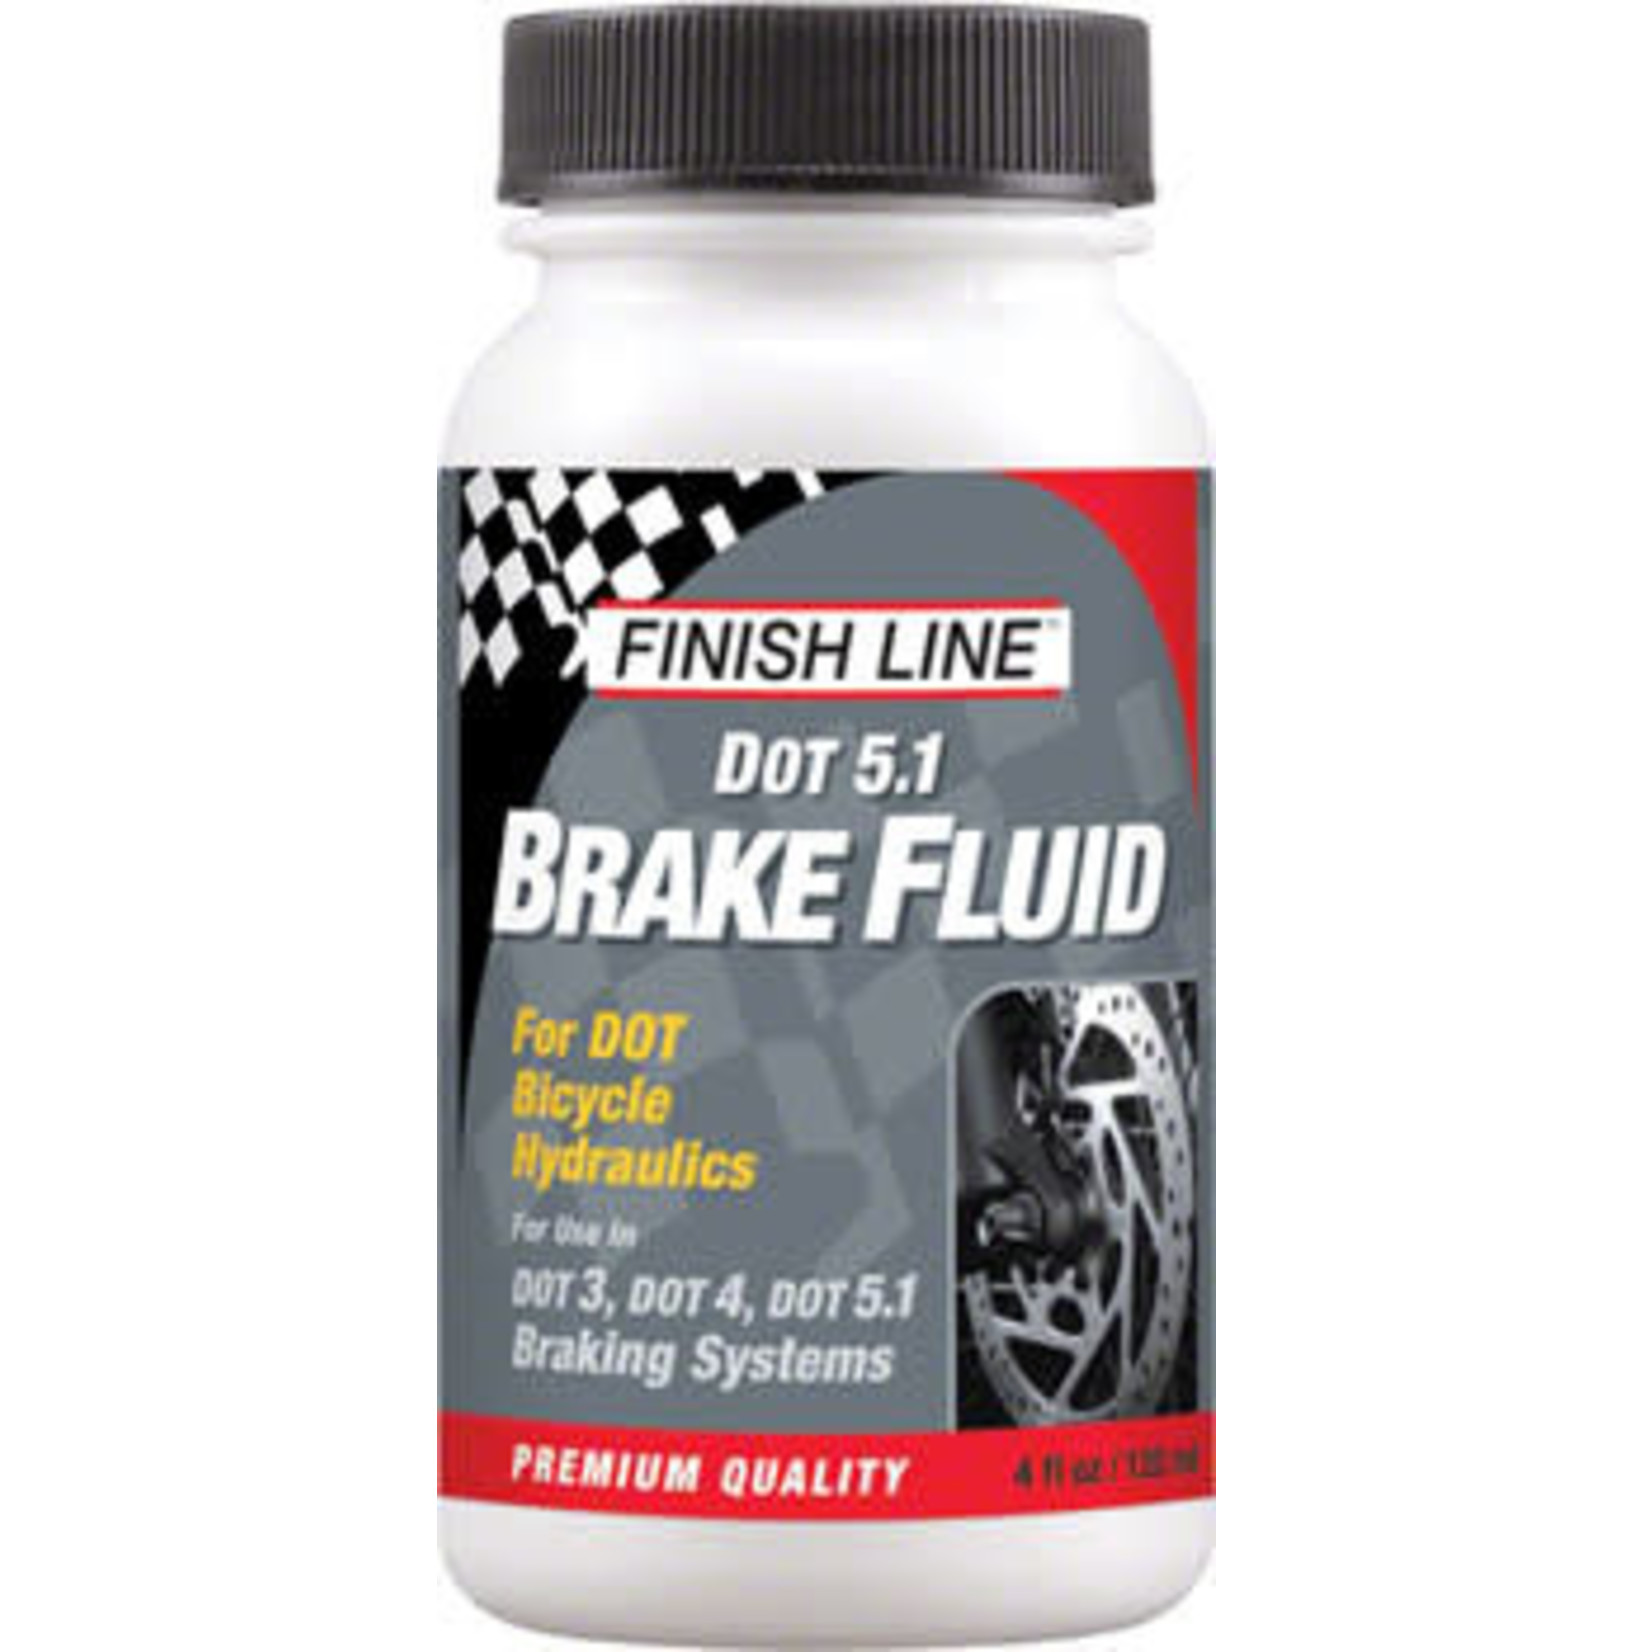 Finish Line DOT 5.1 Brake Fluid, 4oz